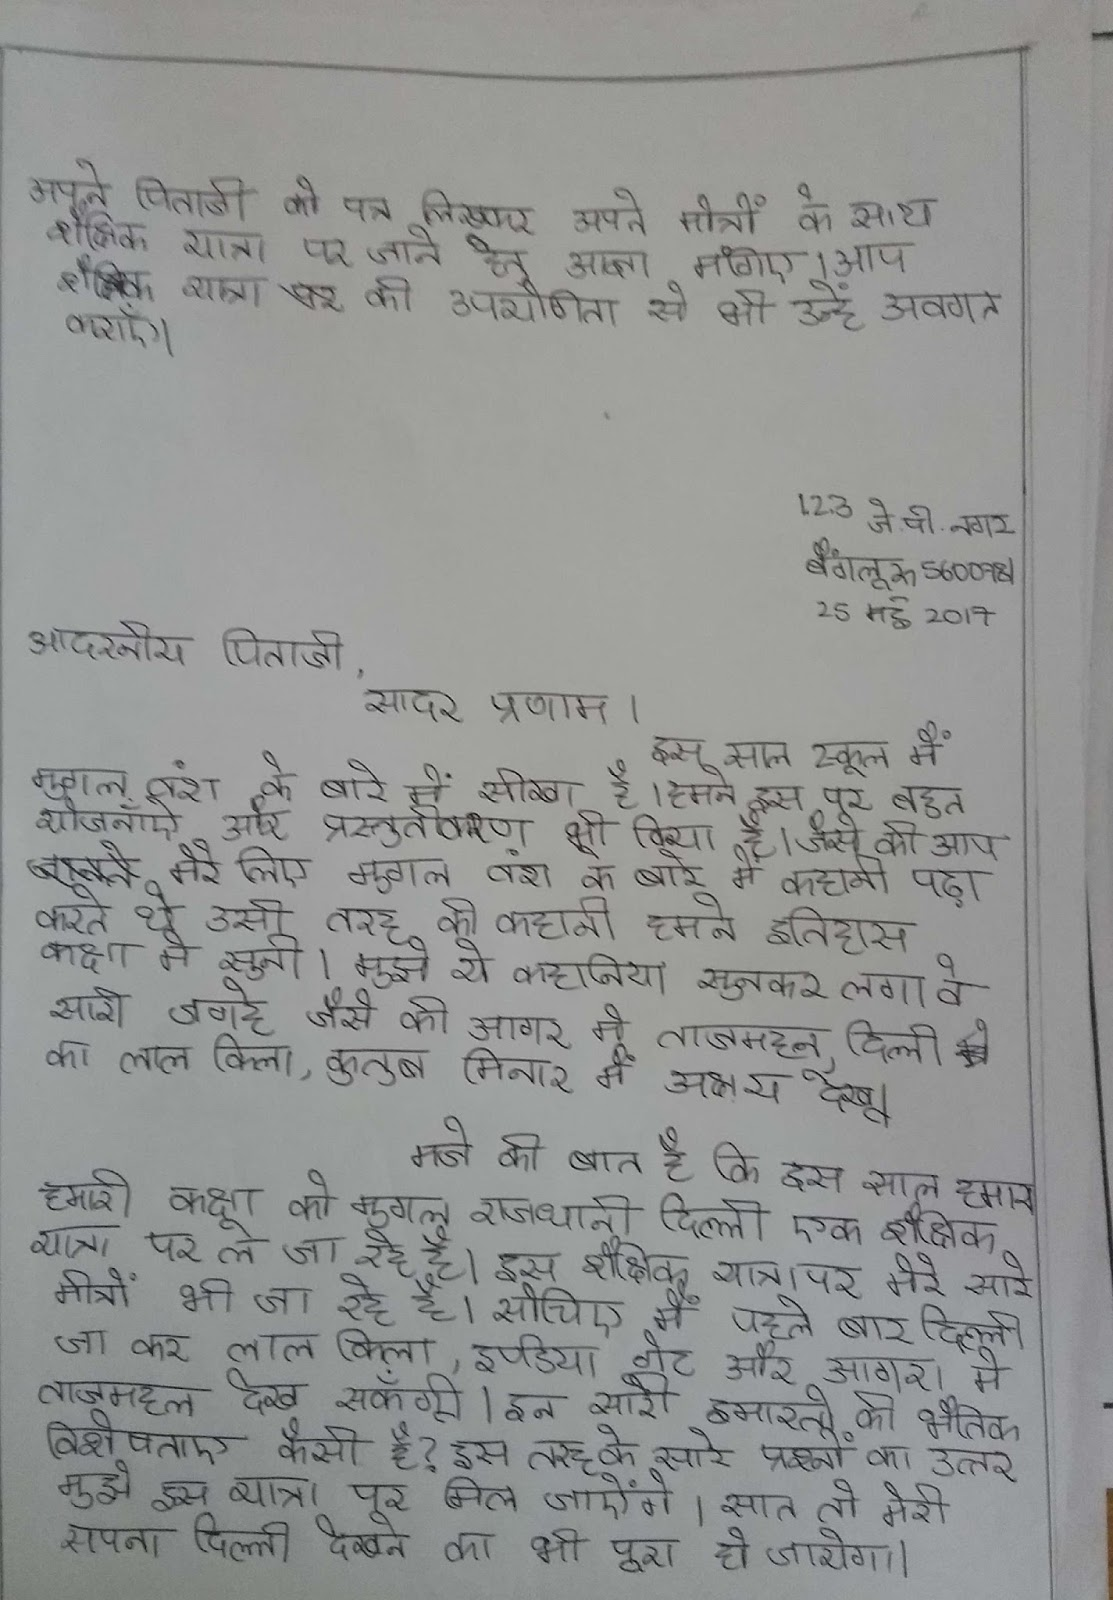 Bachon ki kalam se: Letter to father asking permission to